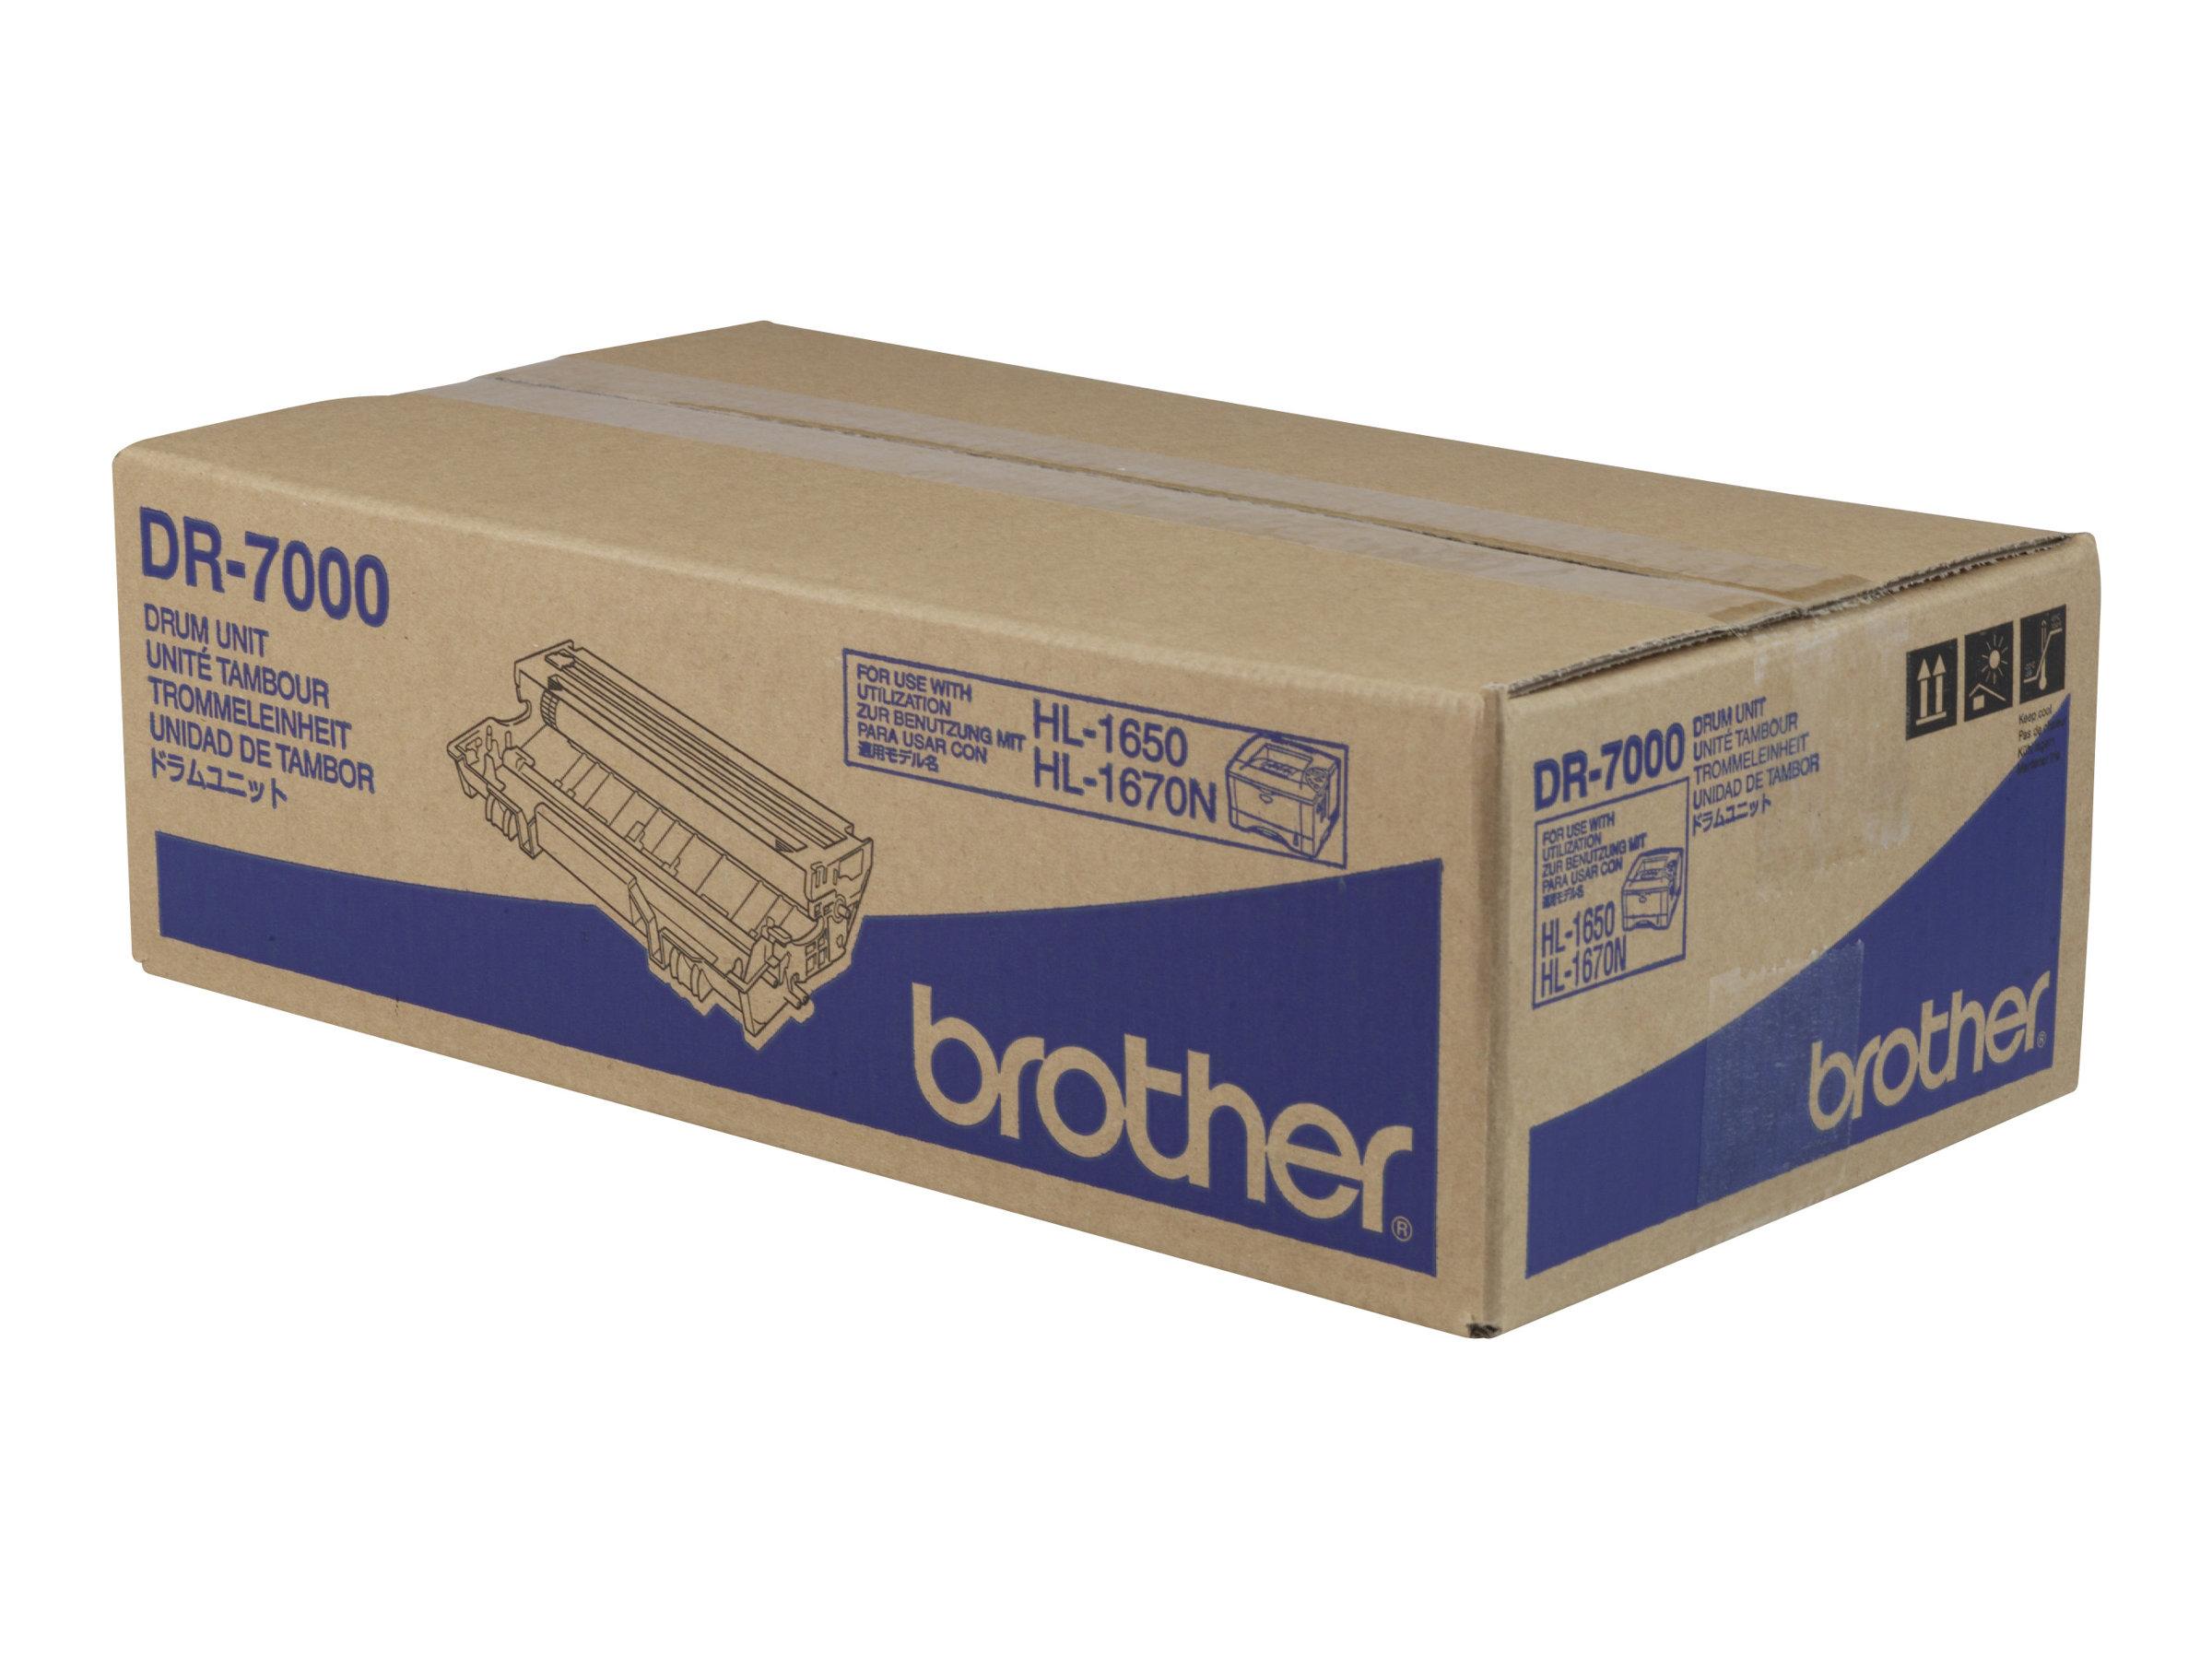 Brother DR7000 - 1 - Schwarz - Trommel-Kit - für Brother DCP-8020, 8025, HL-1650, 1670, 1850, 1870, 5030, 5040, 5050, 5070, MFC-